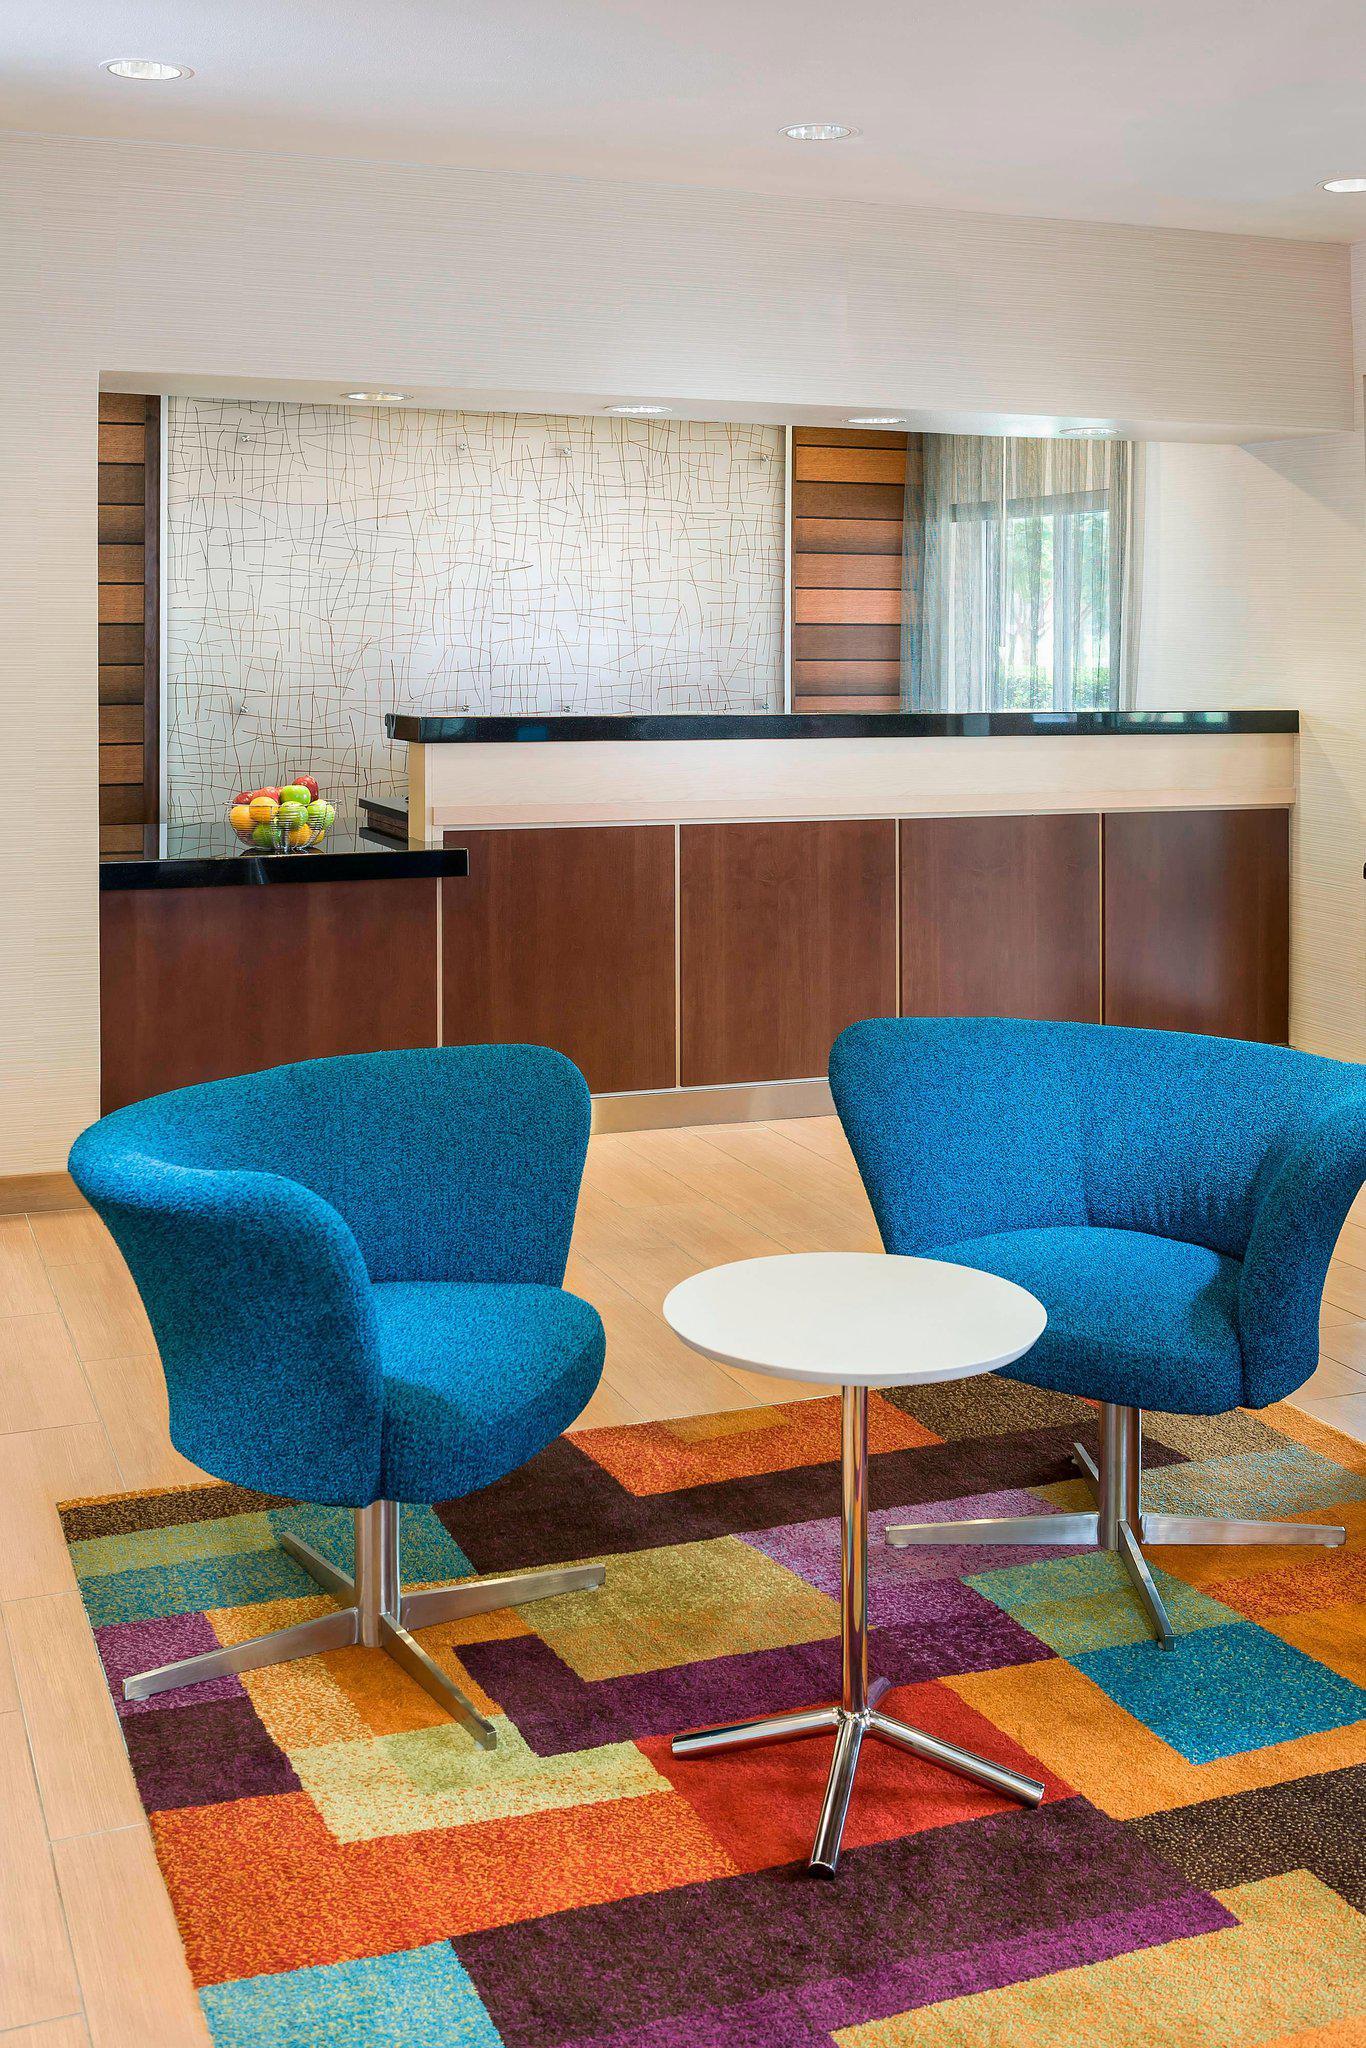 Fairfield Inn & Suites by Marriott Houston Westchase